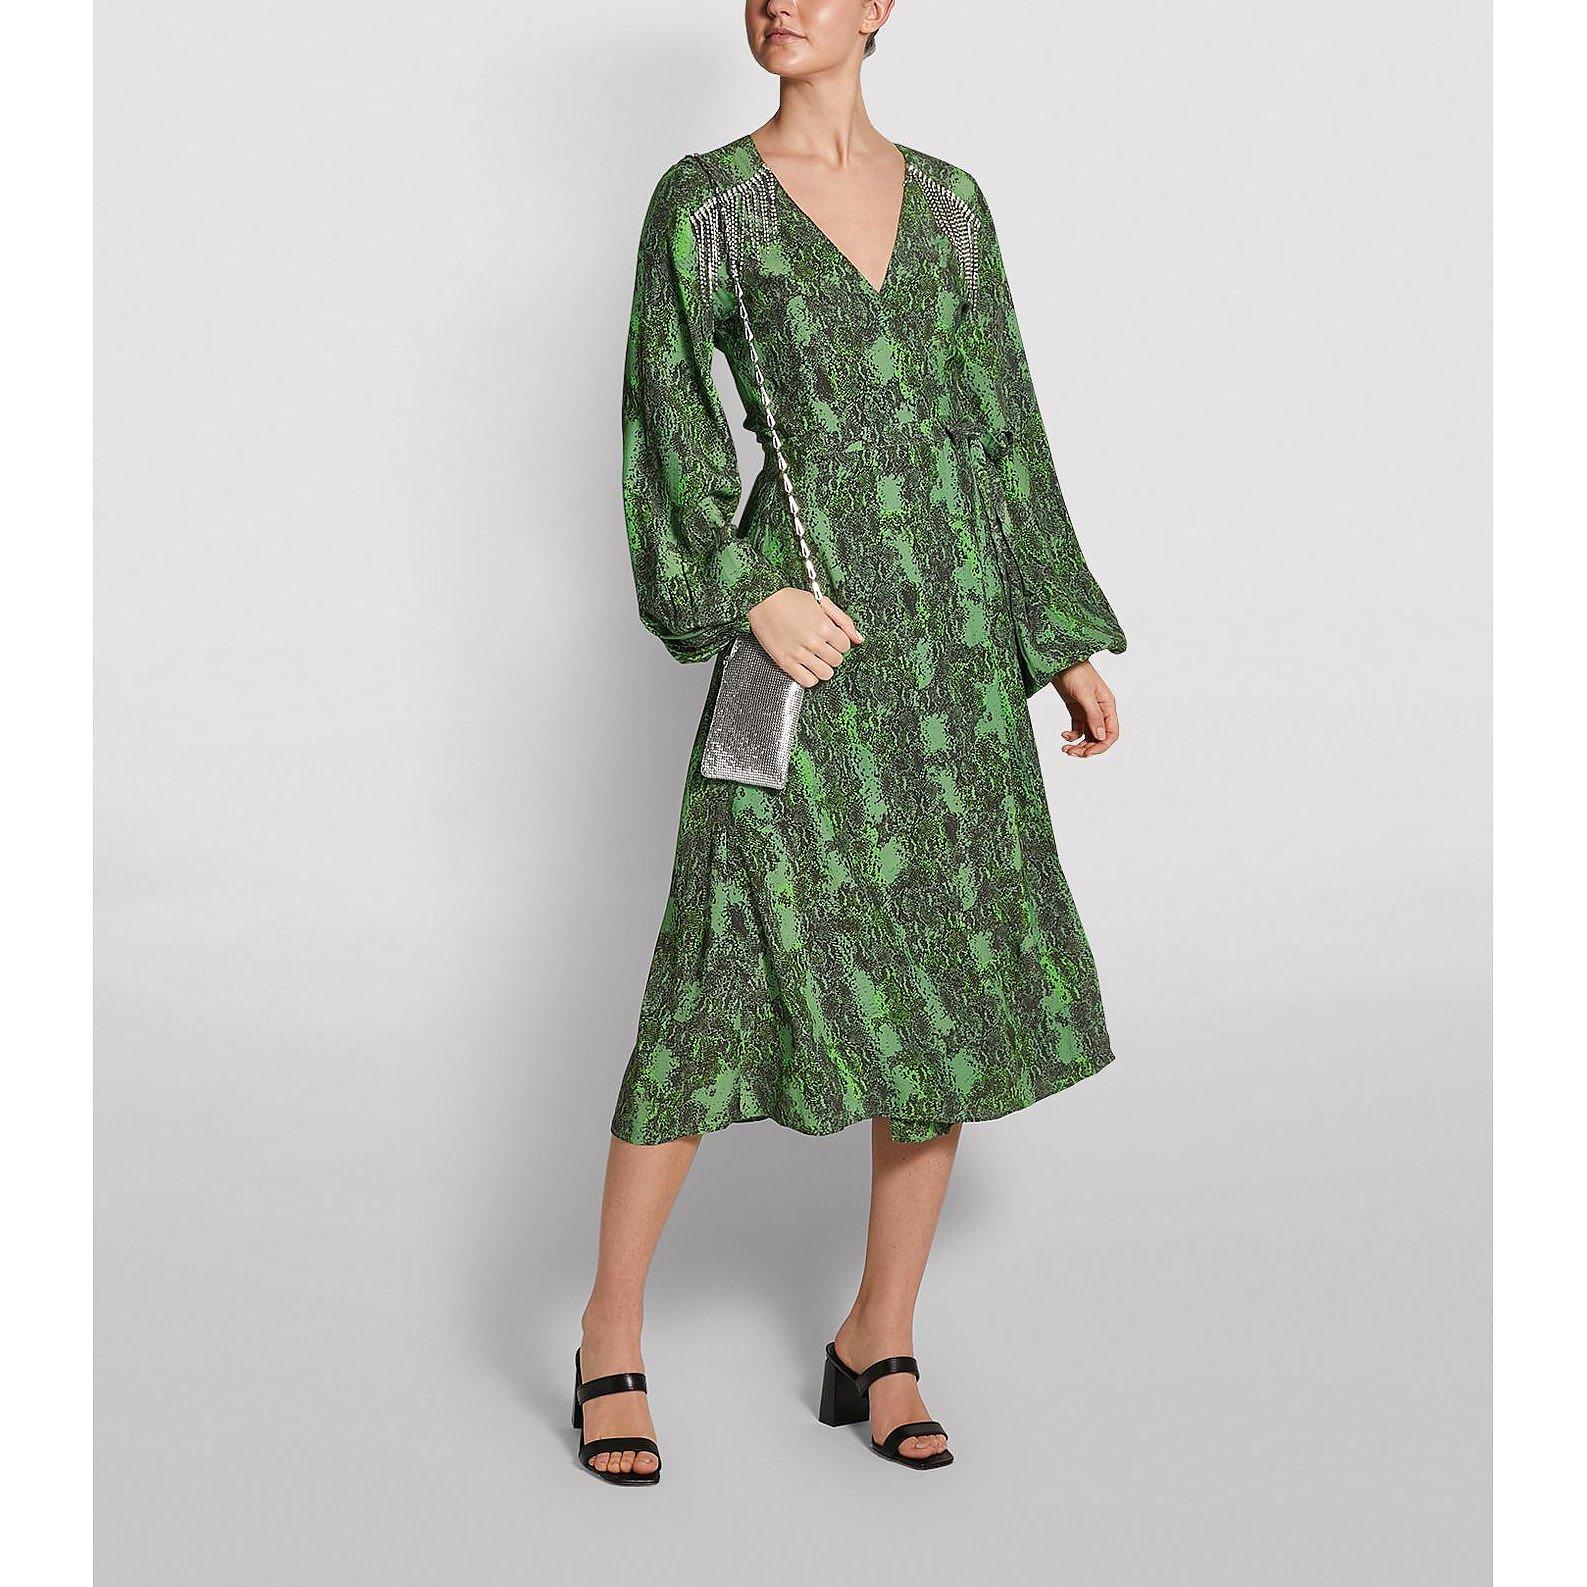 ROTATE Birger Christensen Embellished Kira Midi Dress